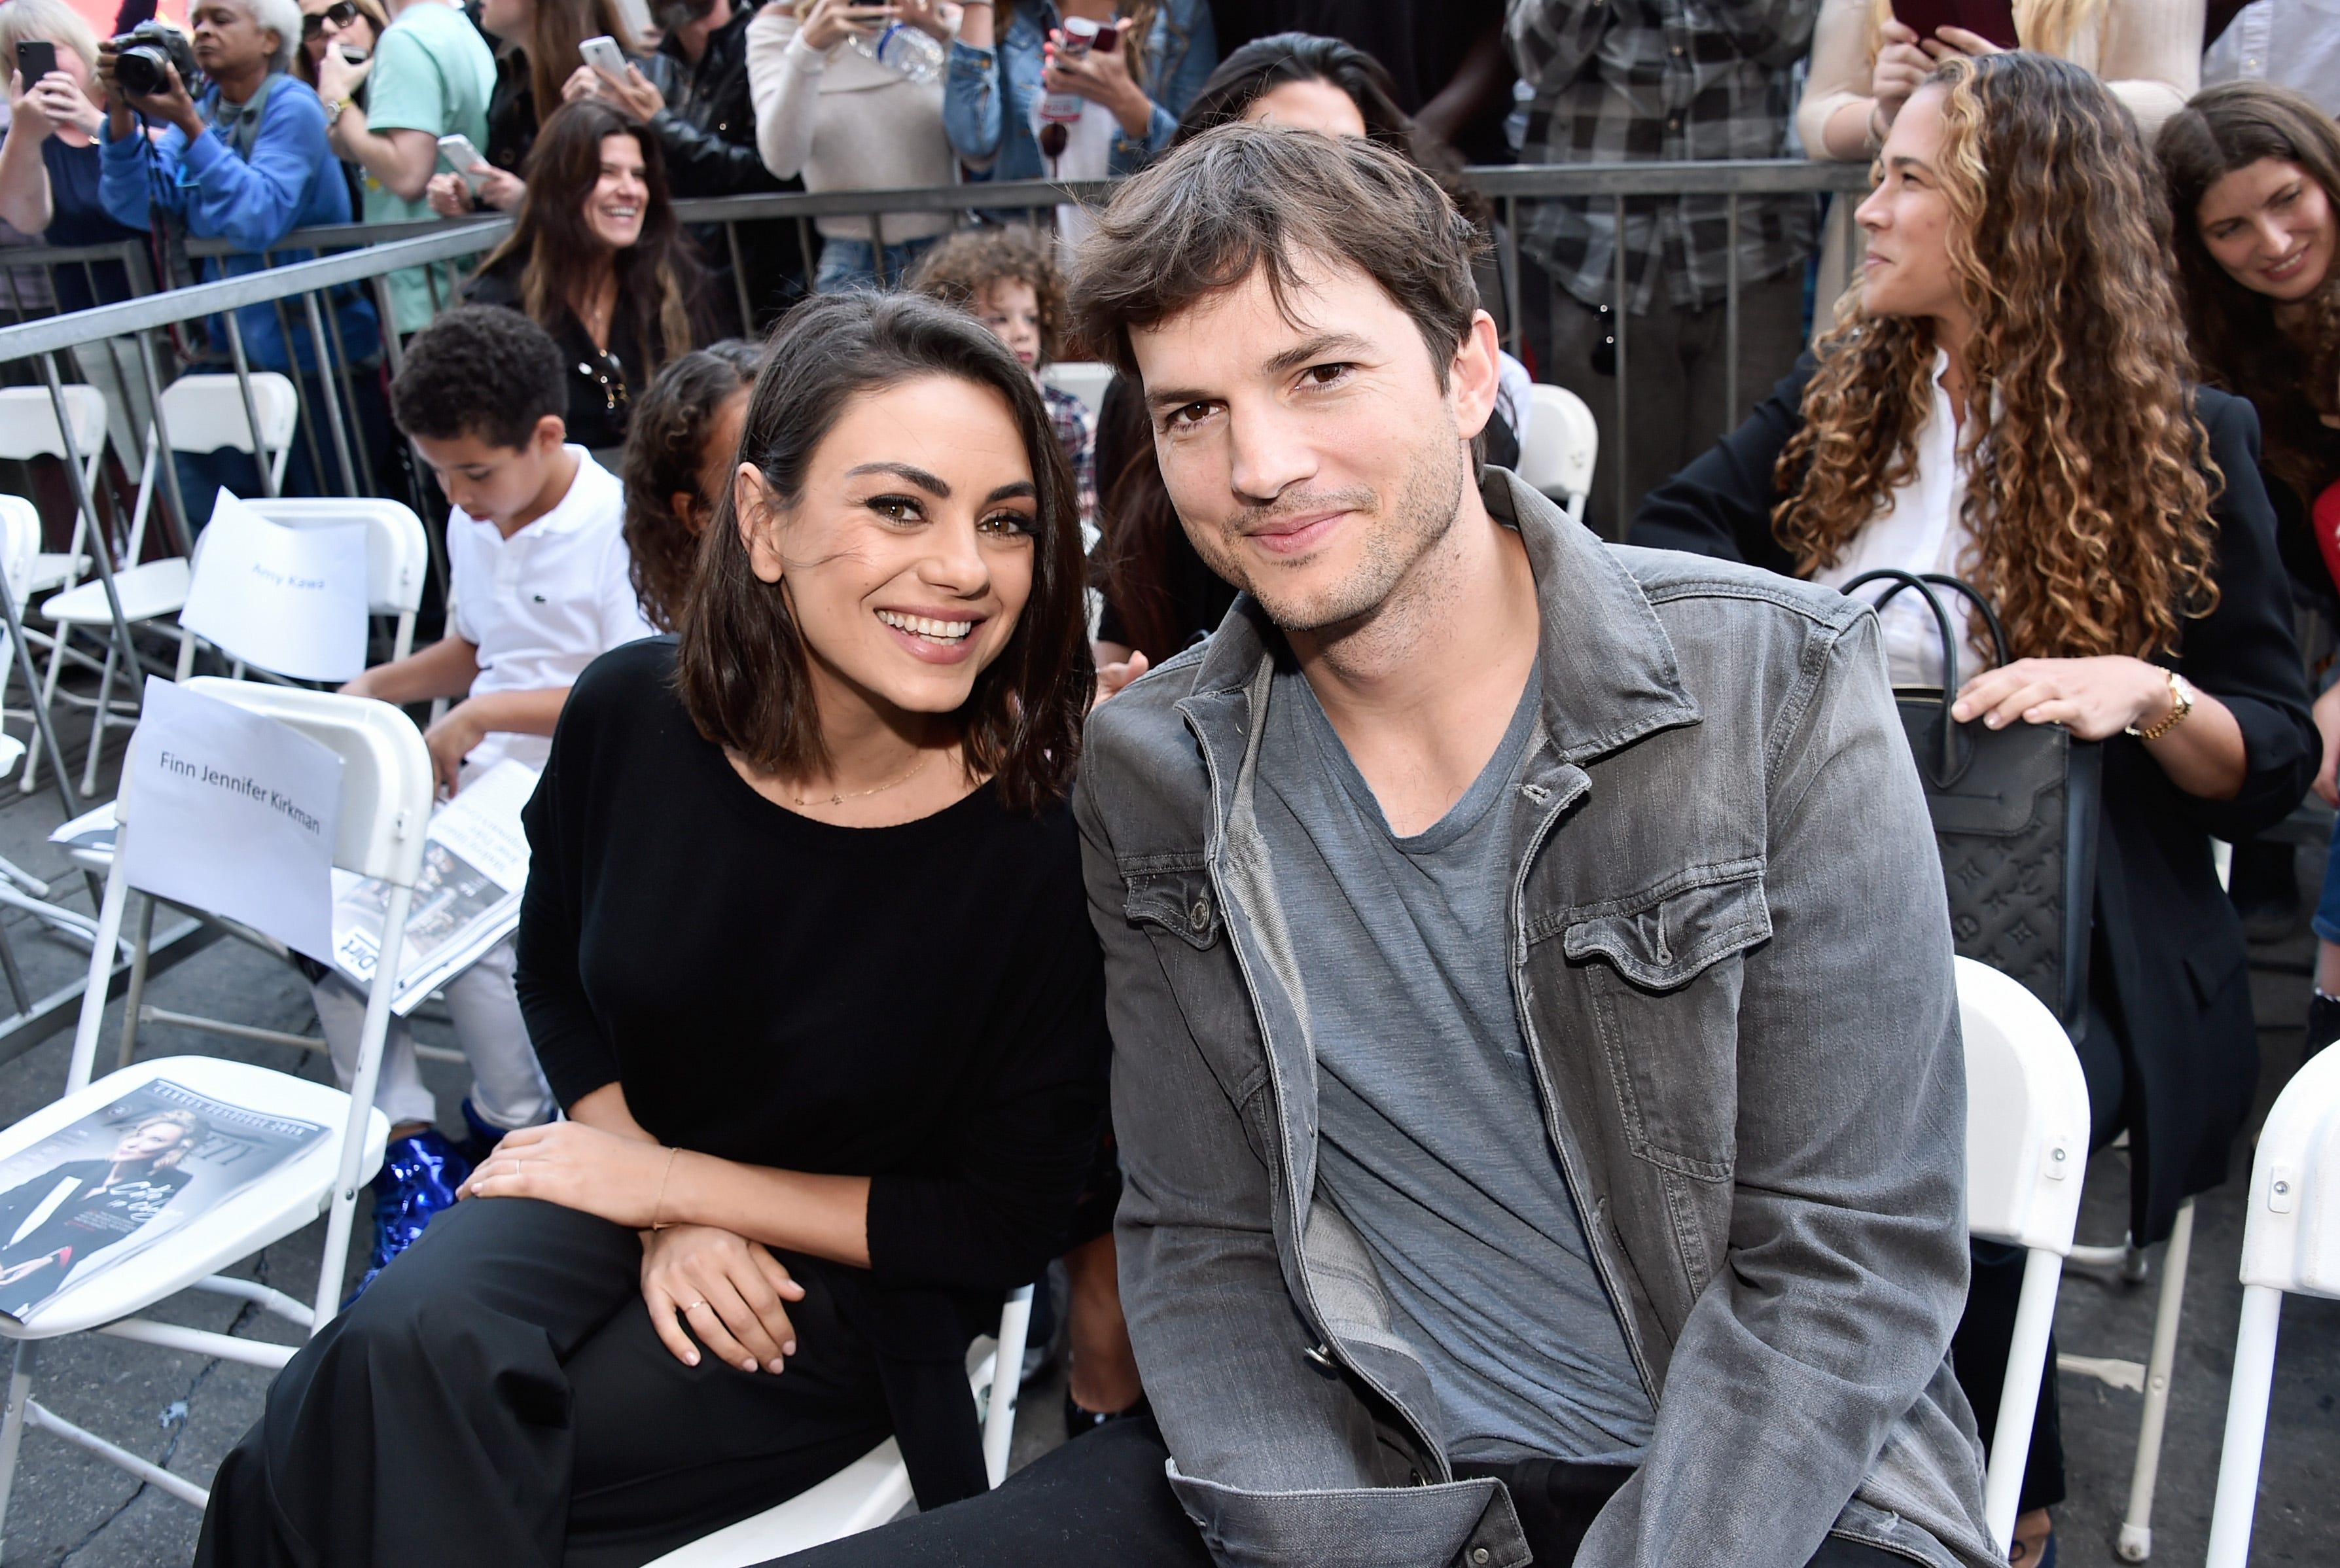 Are ashton kutcher and mila kunis still dating 2019